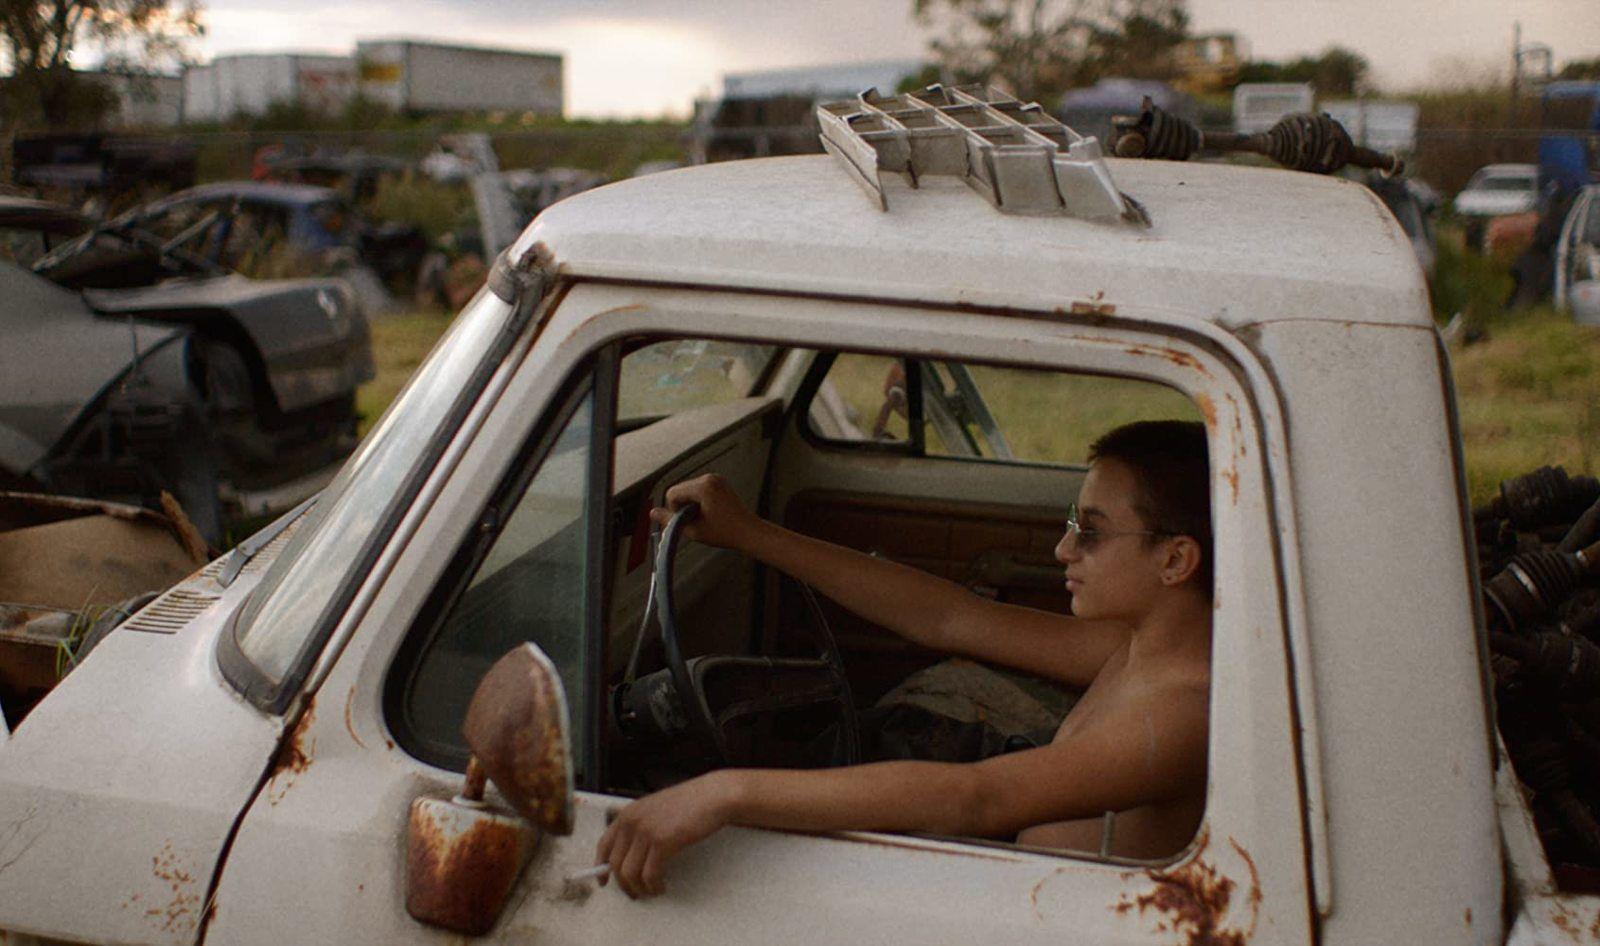 Summer White (Blanco de Verano) de Rodrigo Ruiz Patterson - Le 18 août 2021 au cinéma